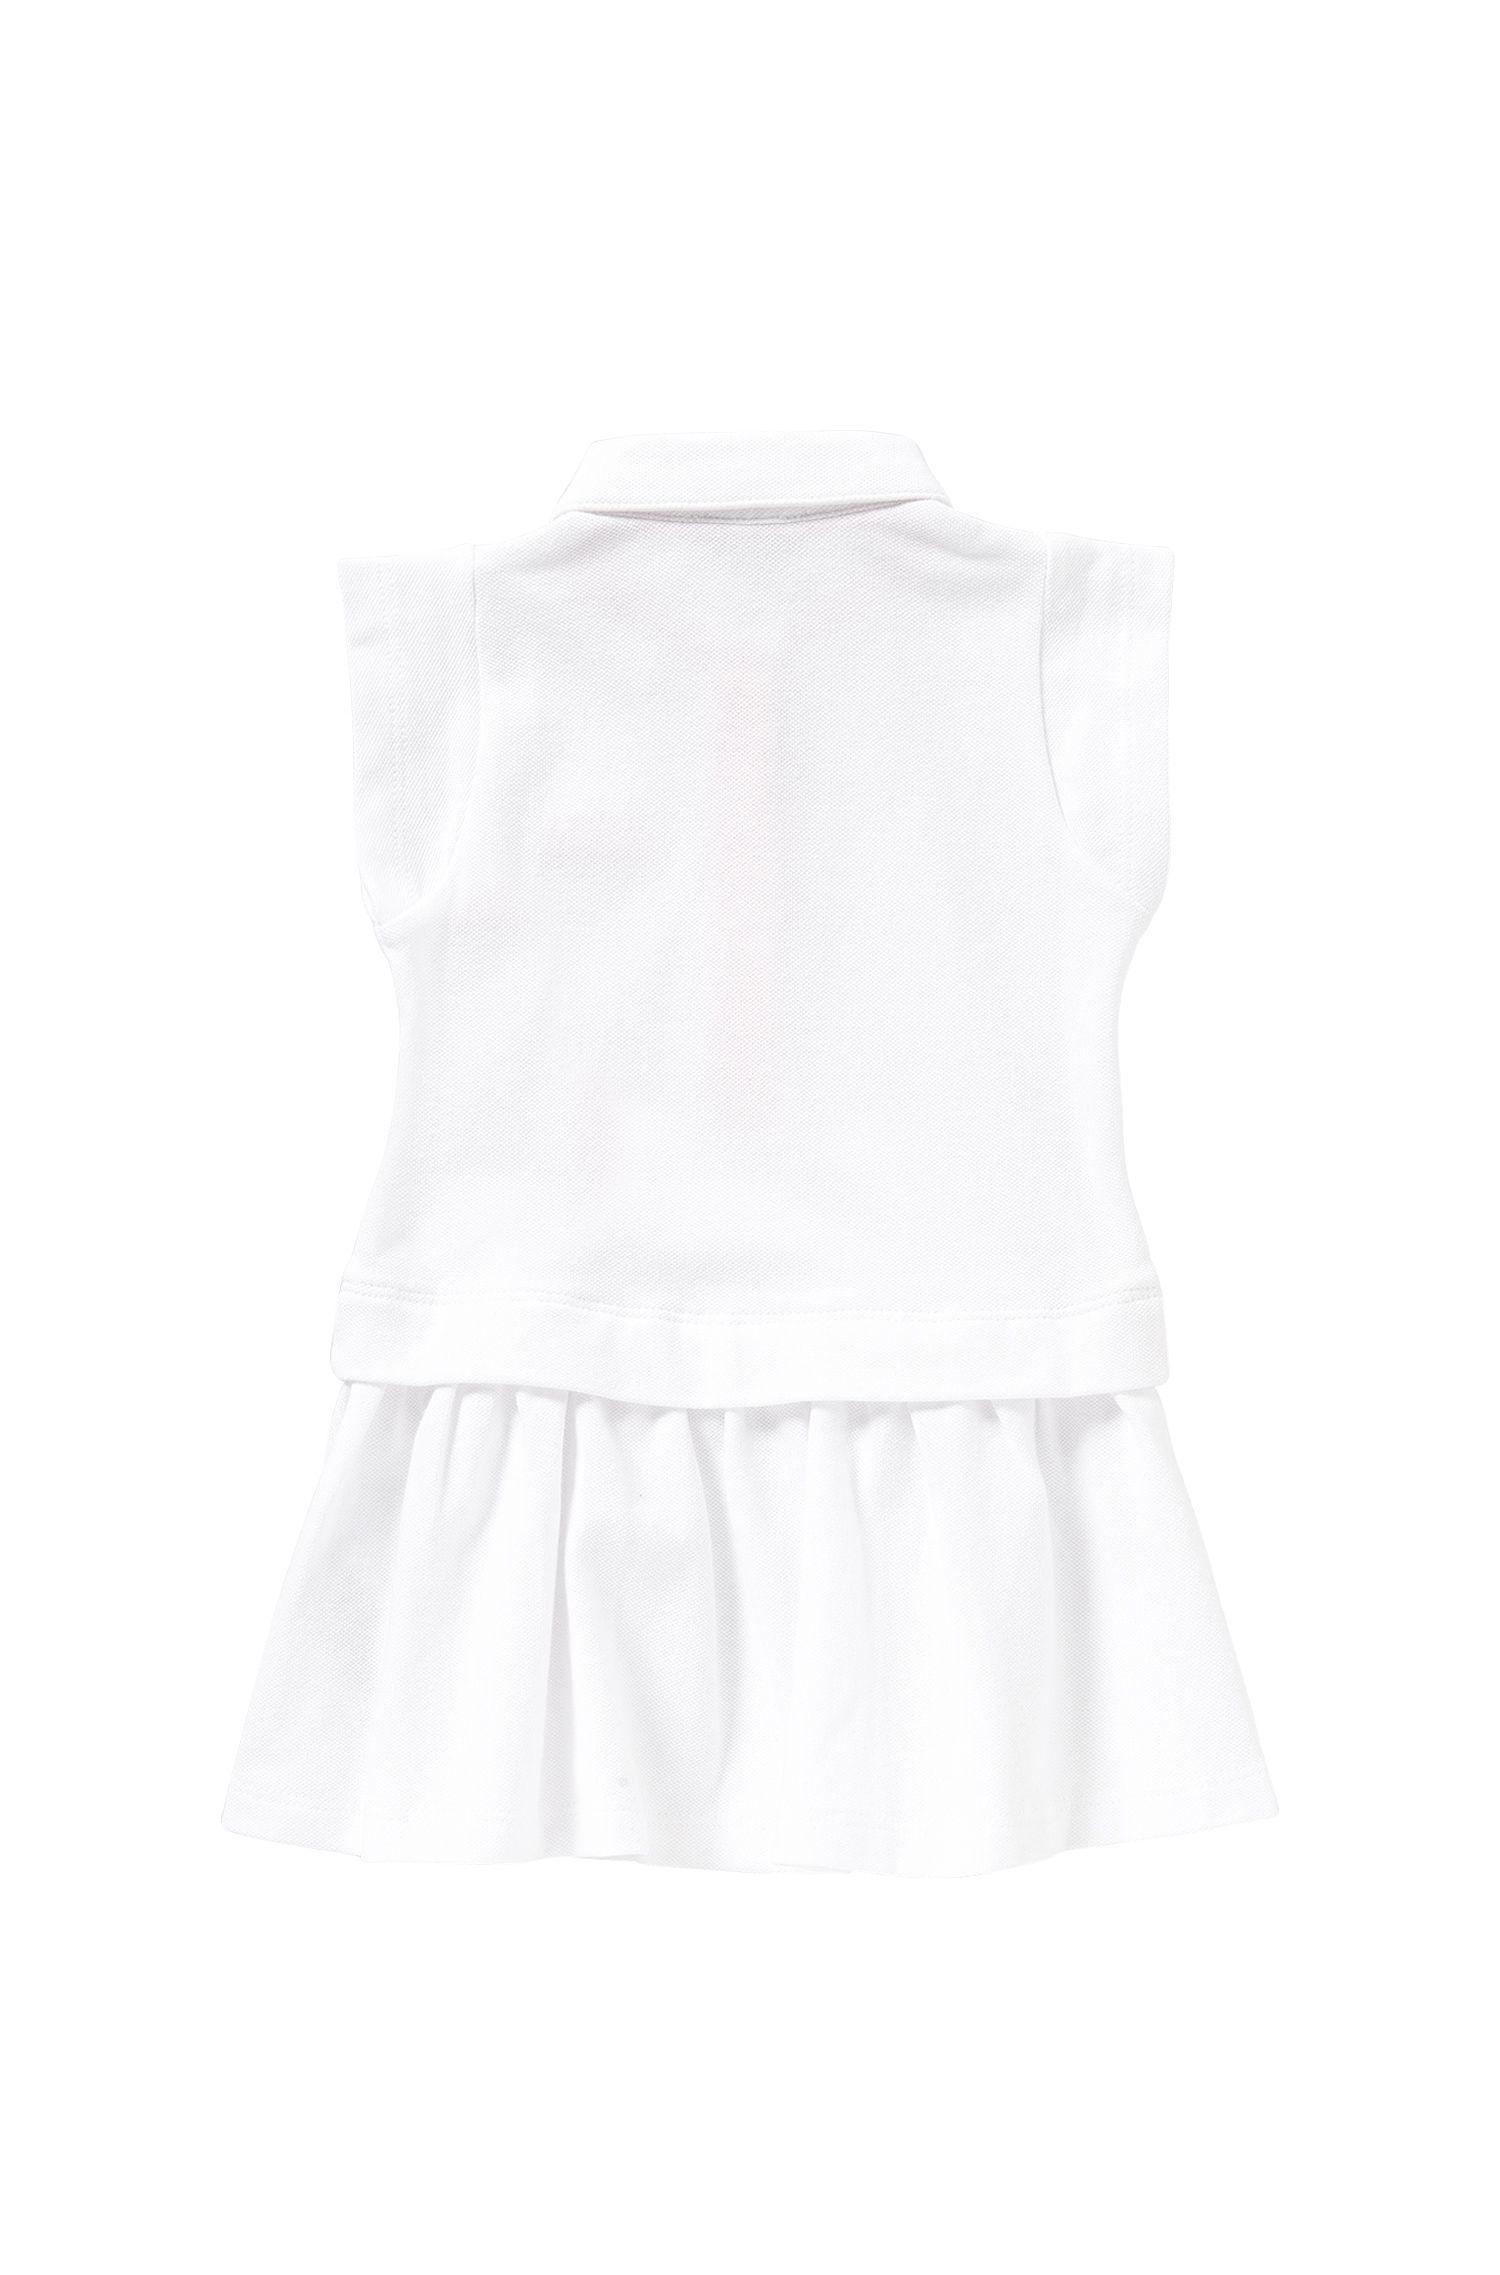 Robe pour enfant en coton stretch de style polo: «J02018»